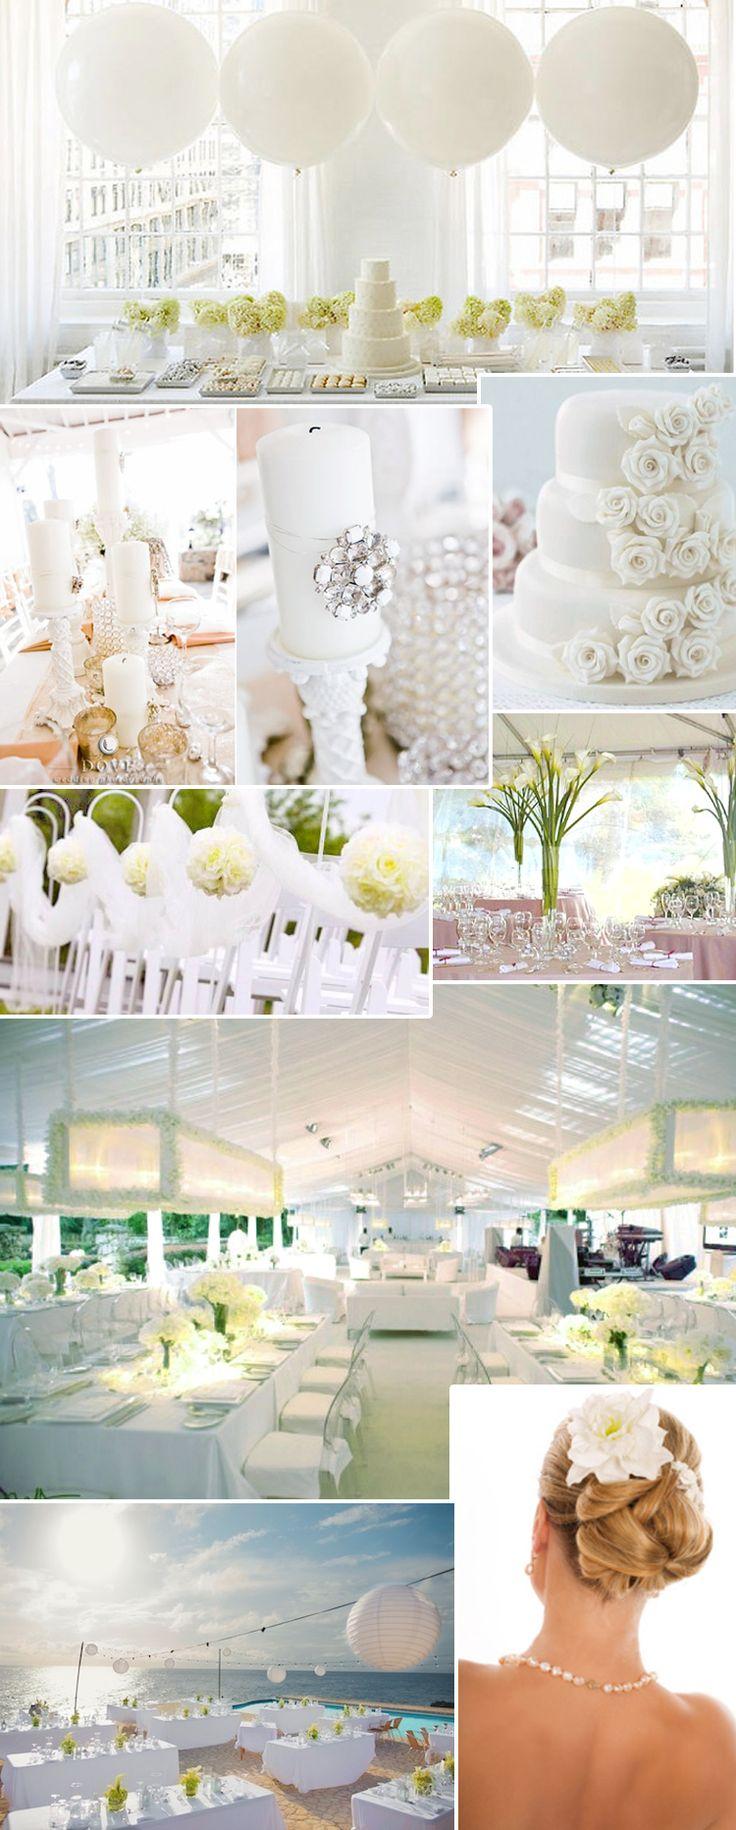 Nice Weddings Themes Crest - The Wedding Ideas - onecallinsurance.info